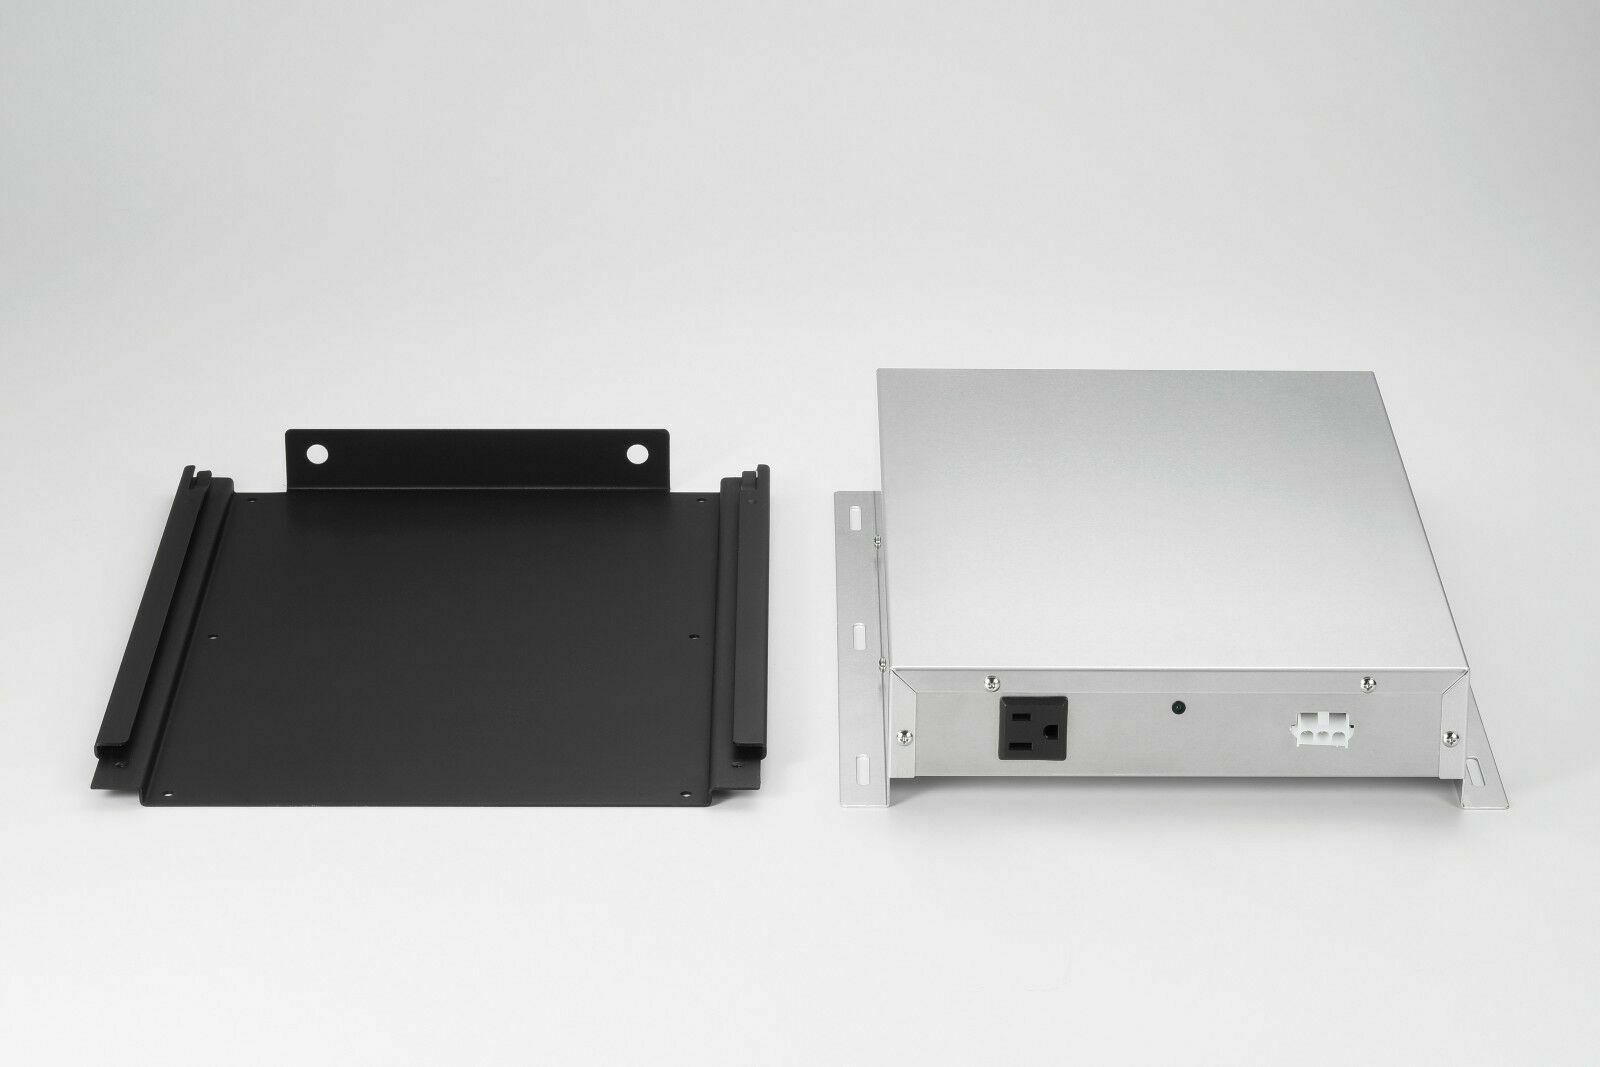 как выглядит PowerXchanger XS-05 GA Slimline Series SMART Voltage Frequency Converter фото